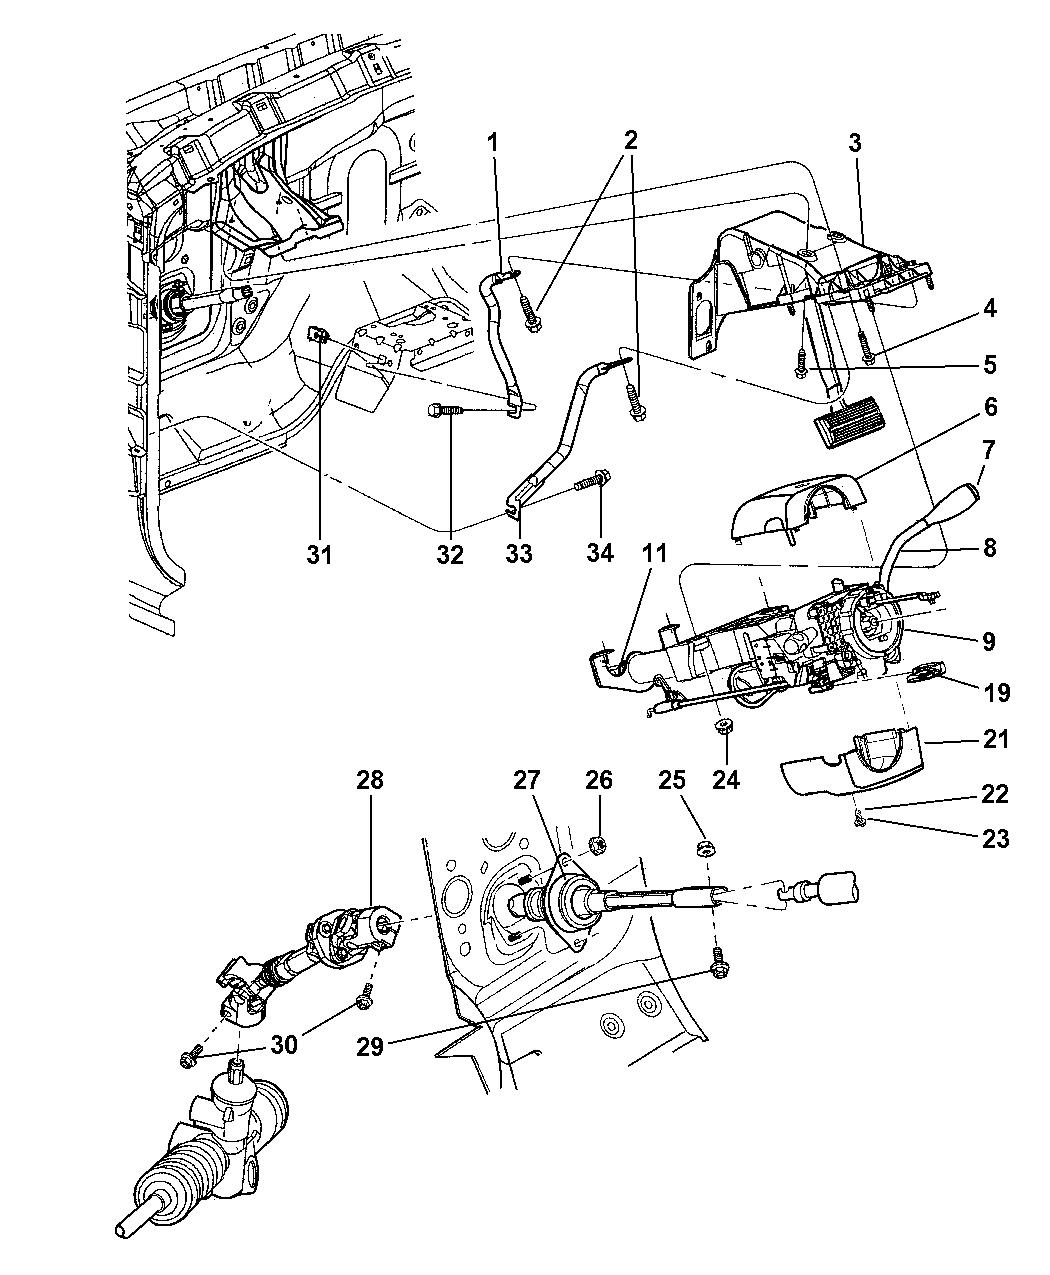 2001 Dodge Durango Column, Steering, Upper & Lower